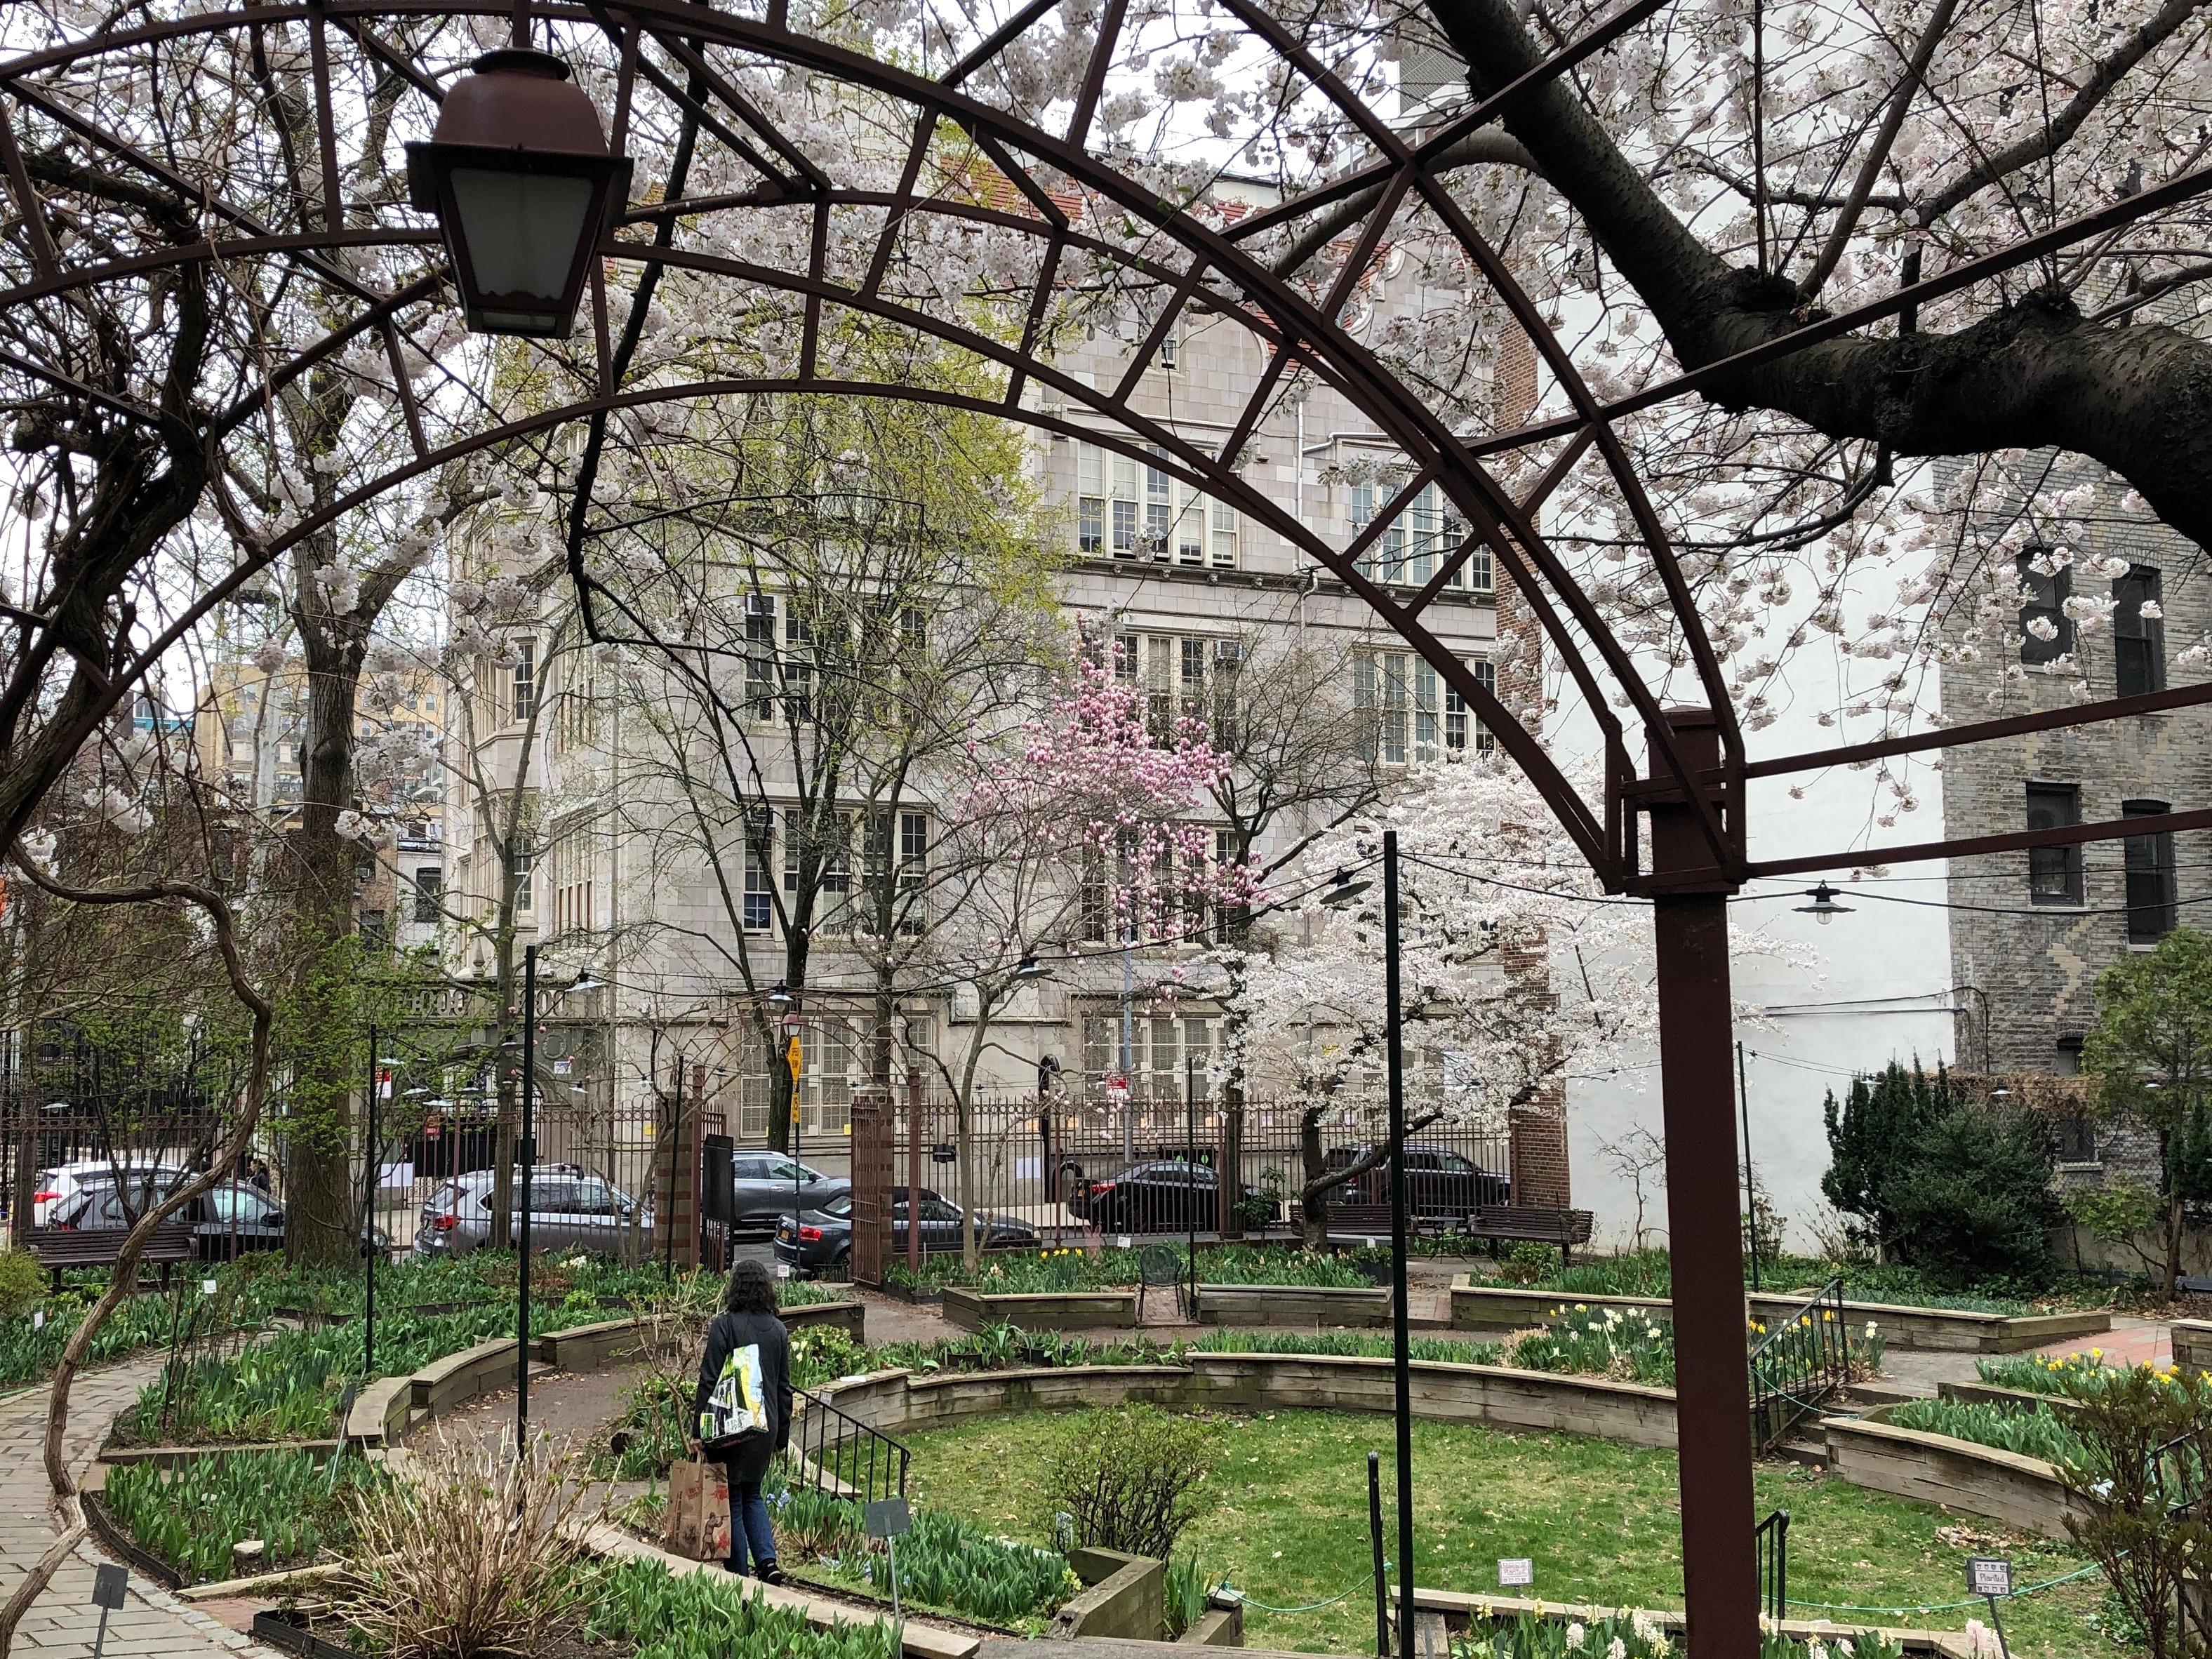 041219-.community-garden-in-spring